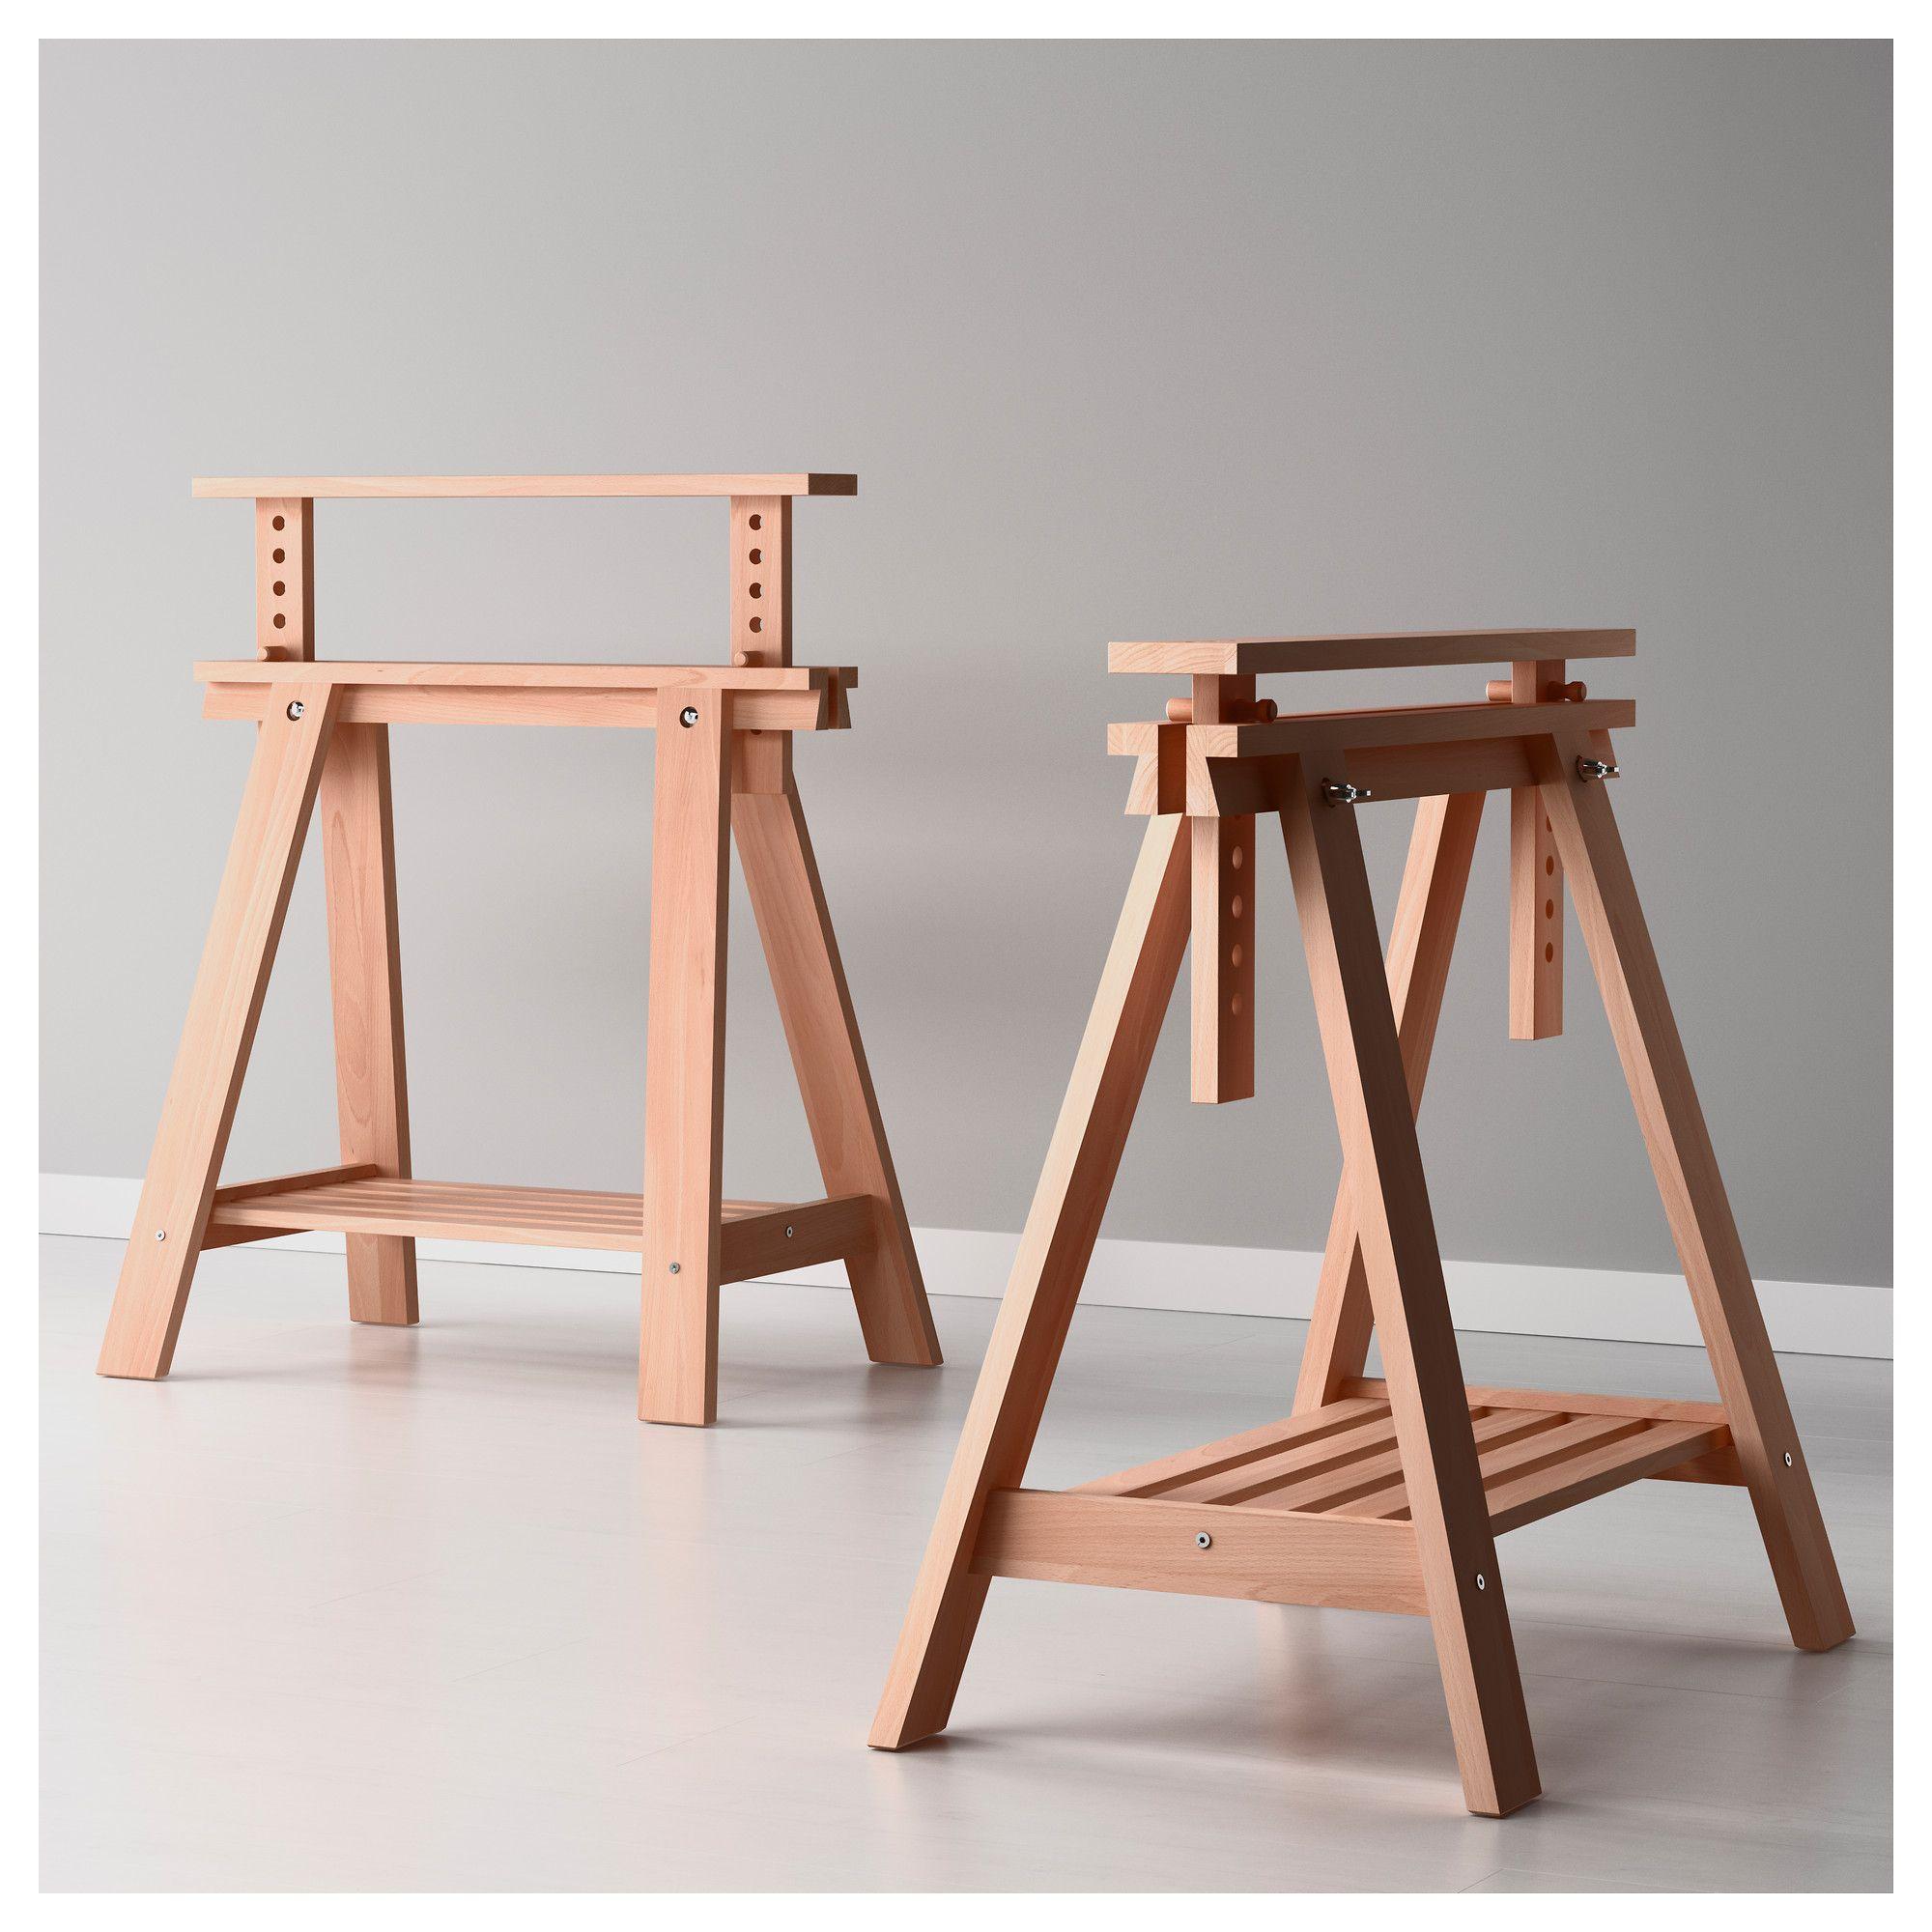 mesas de dibujo medidas buscar con google mesas de dibujo pinterest outillage usinage. Black Bedroom Furniture Sets. Home Design Ideas